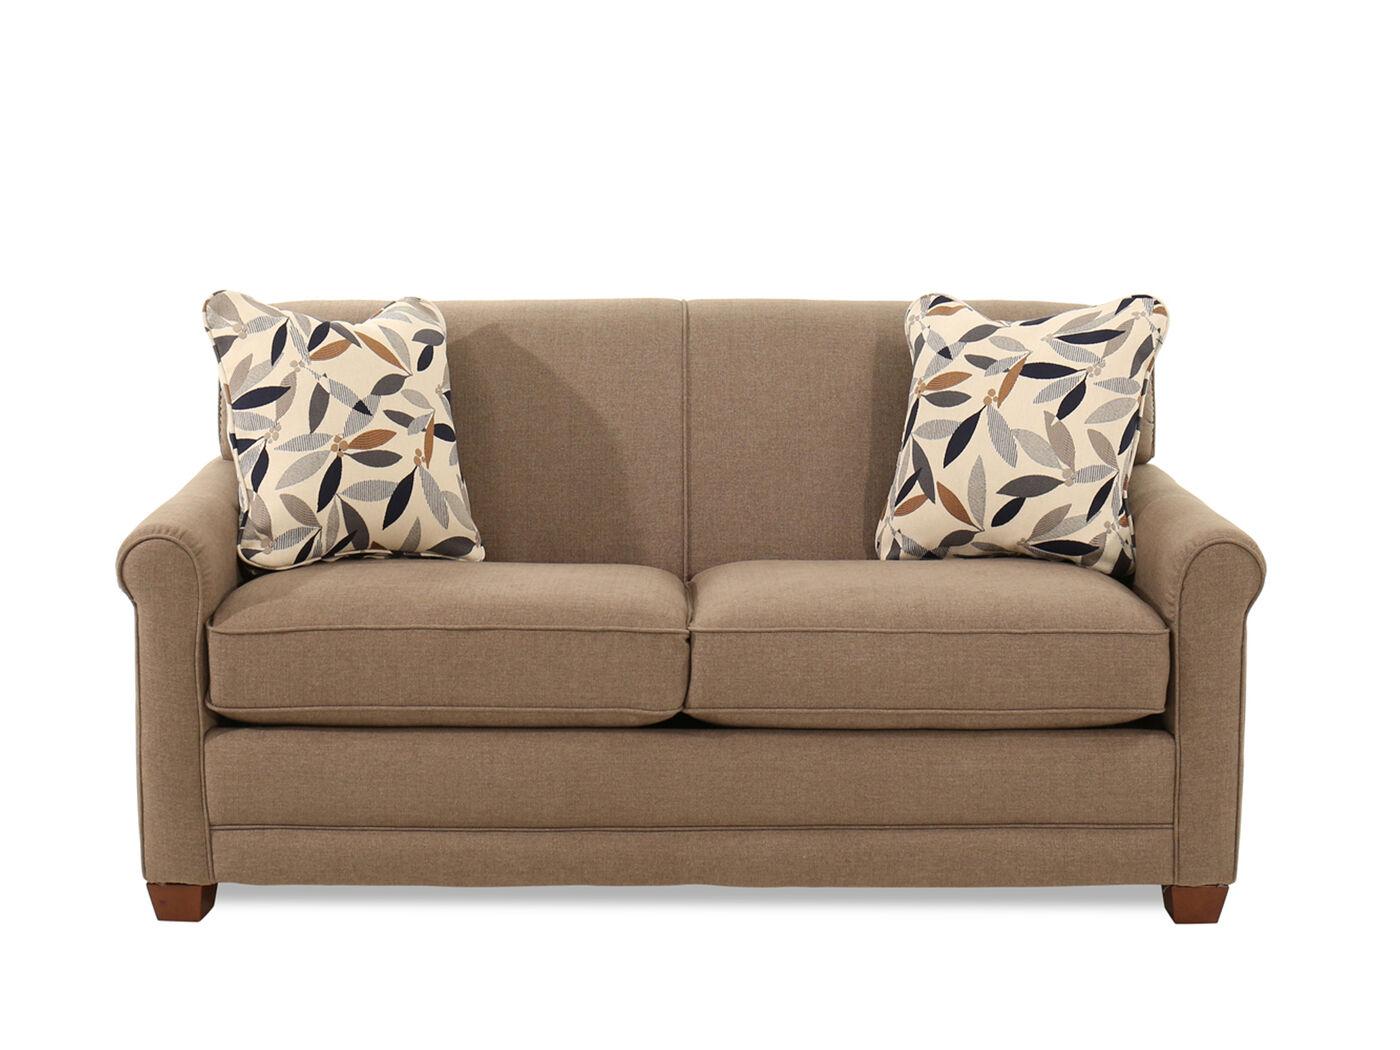 La Z Boy Premier Supreme fort Full Sleeper Sofa